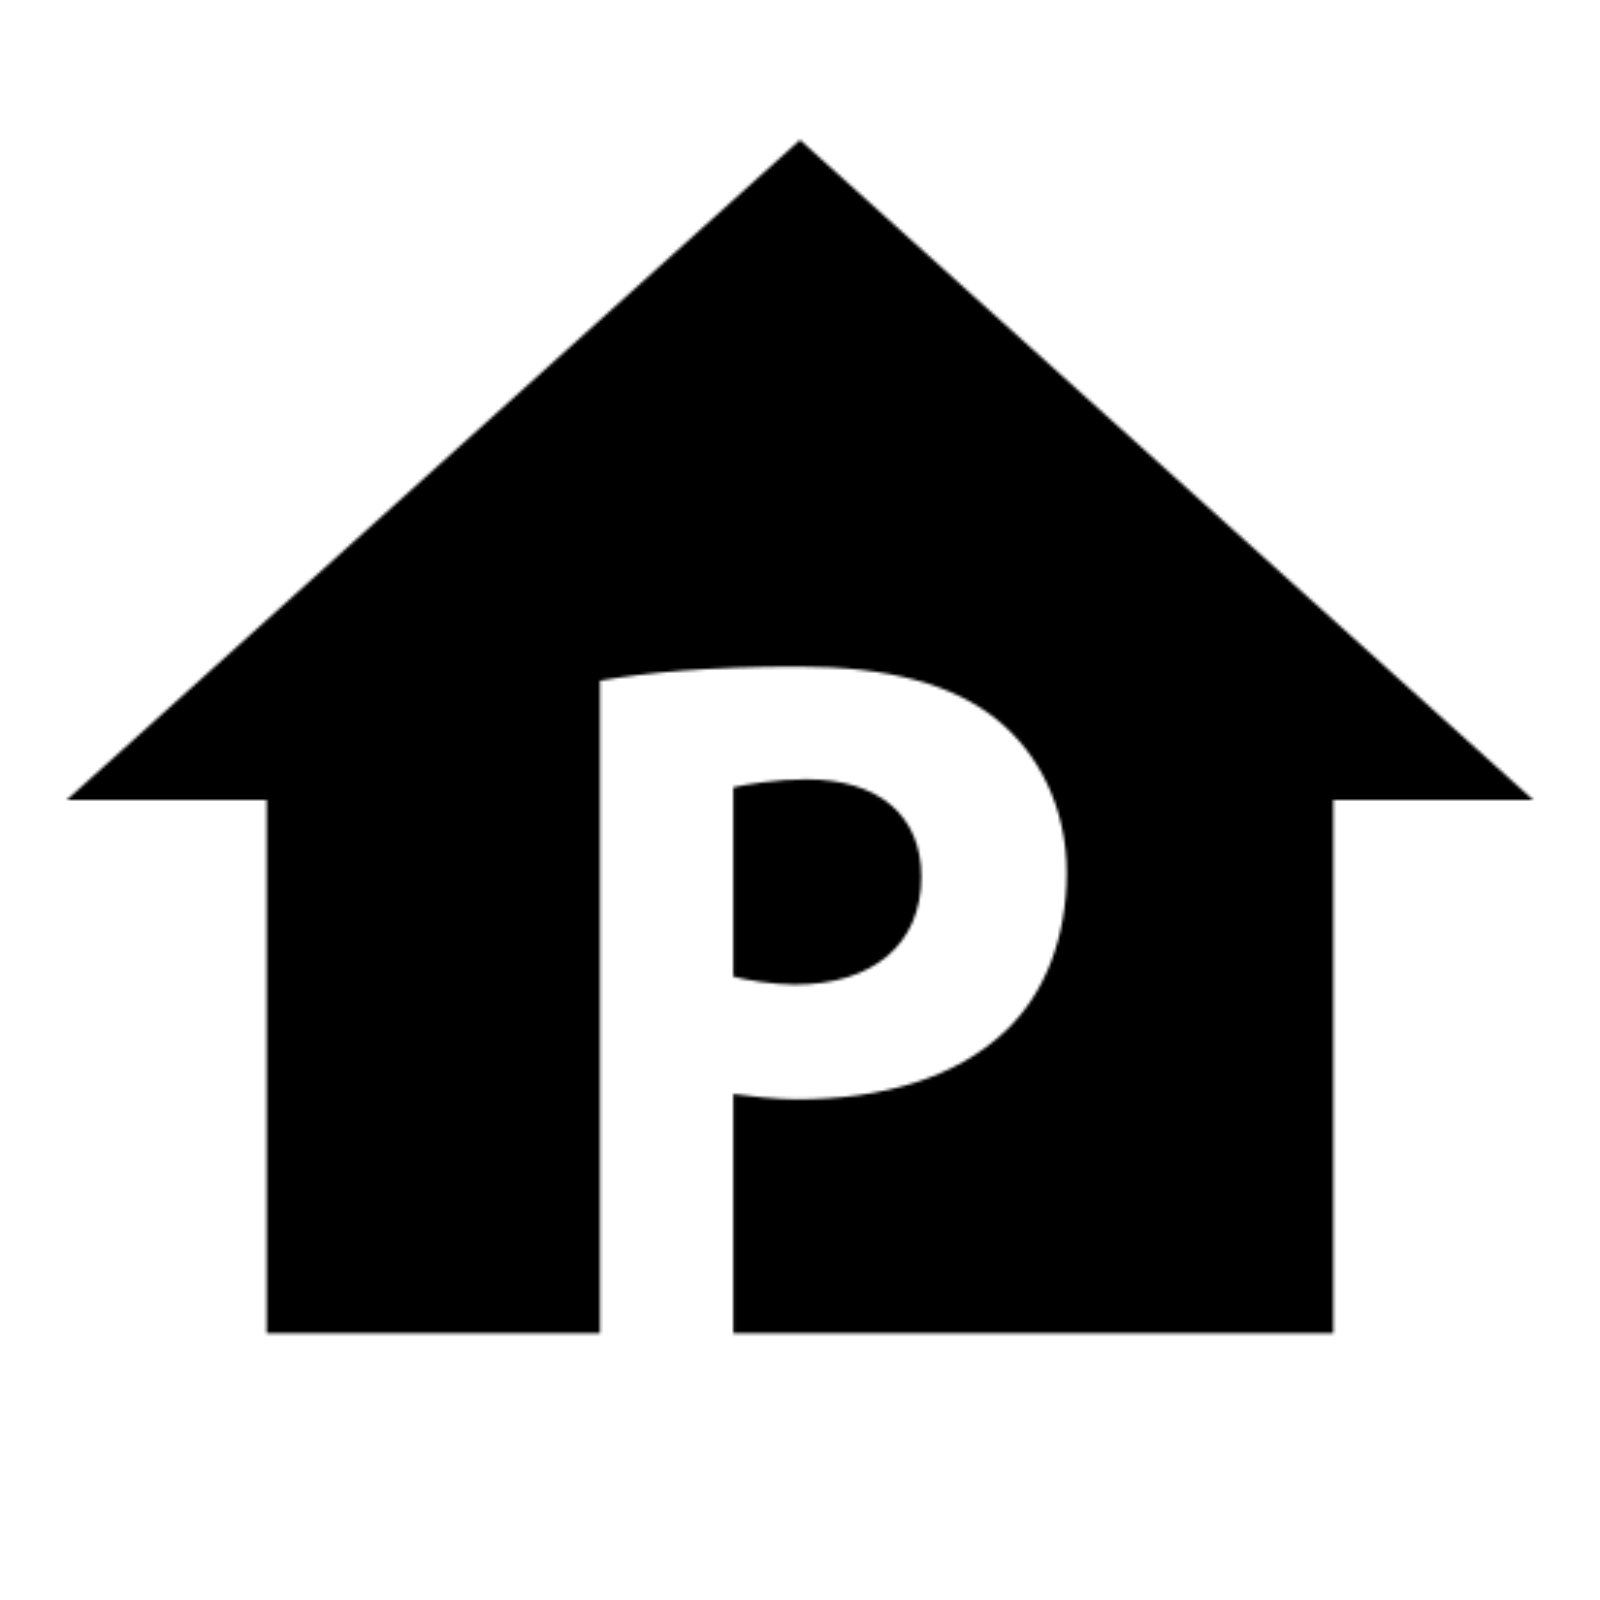 Carpark icon